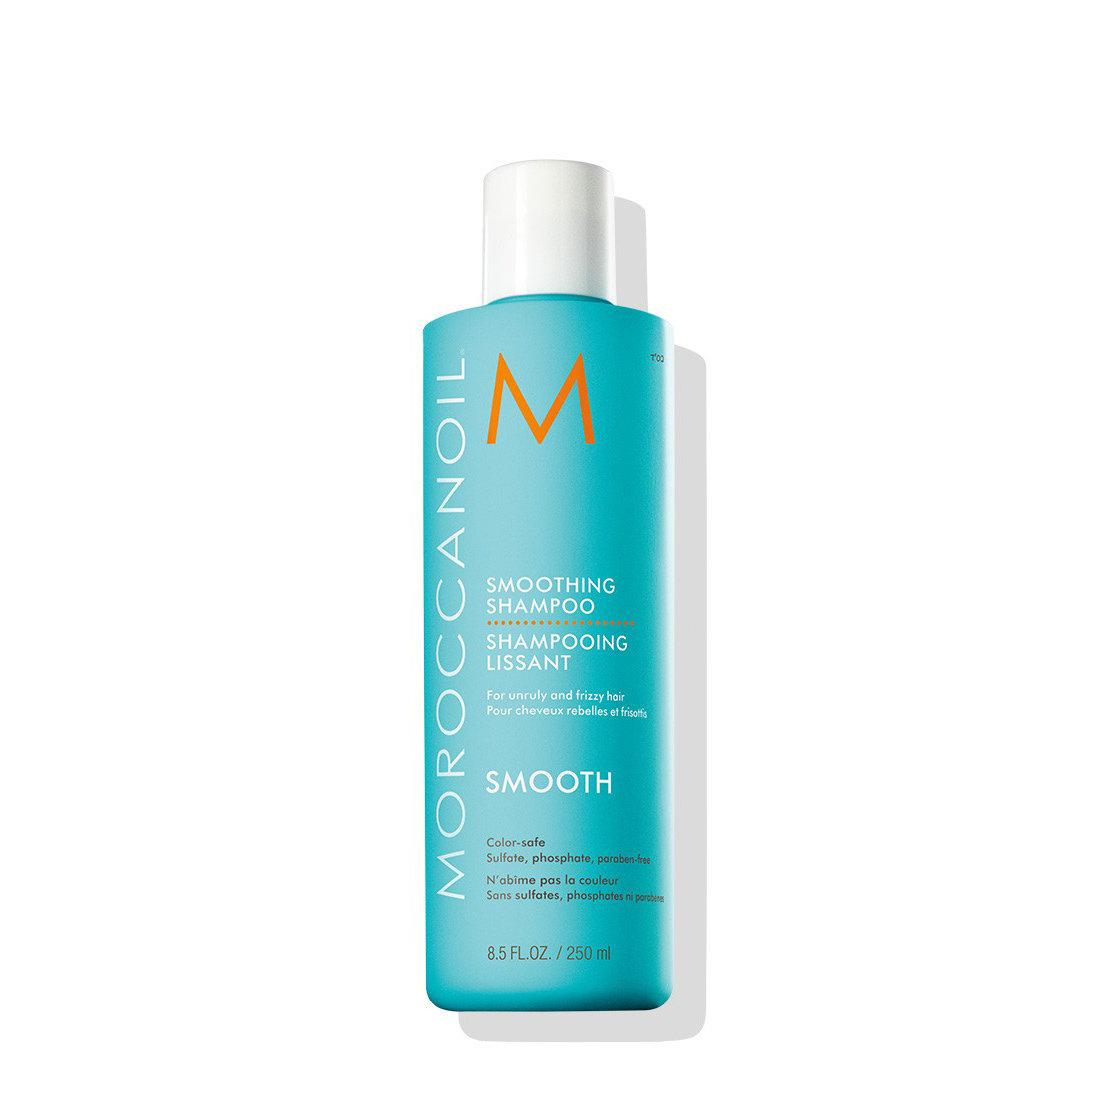 Moroccanoil Smoothing Shampoo 250 ml | Shampoo Suavizante